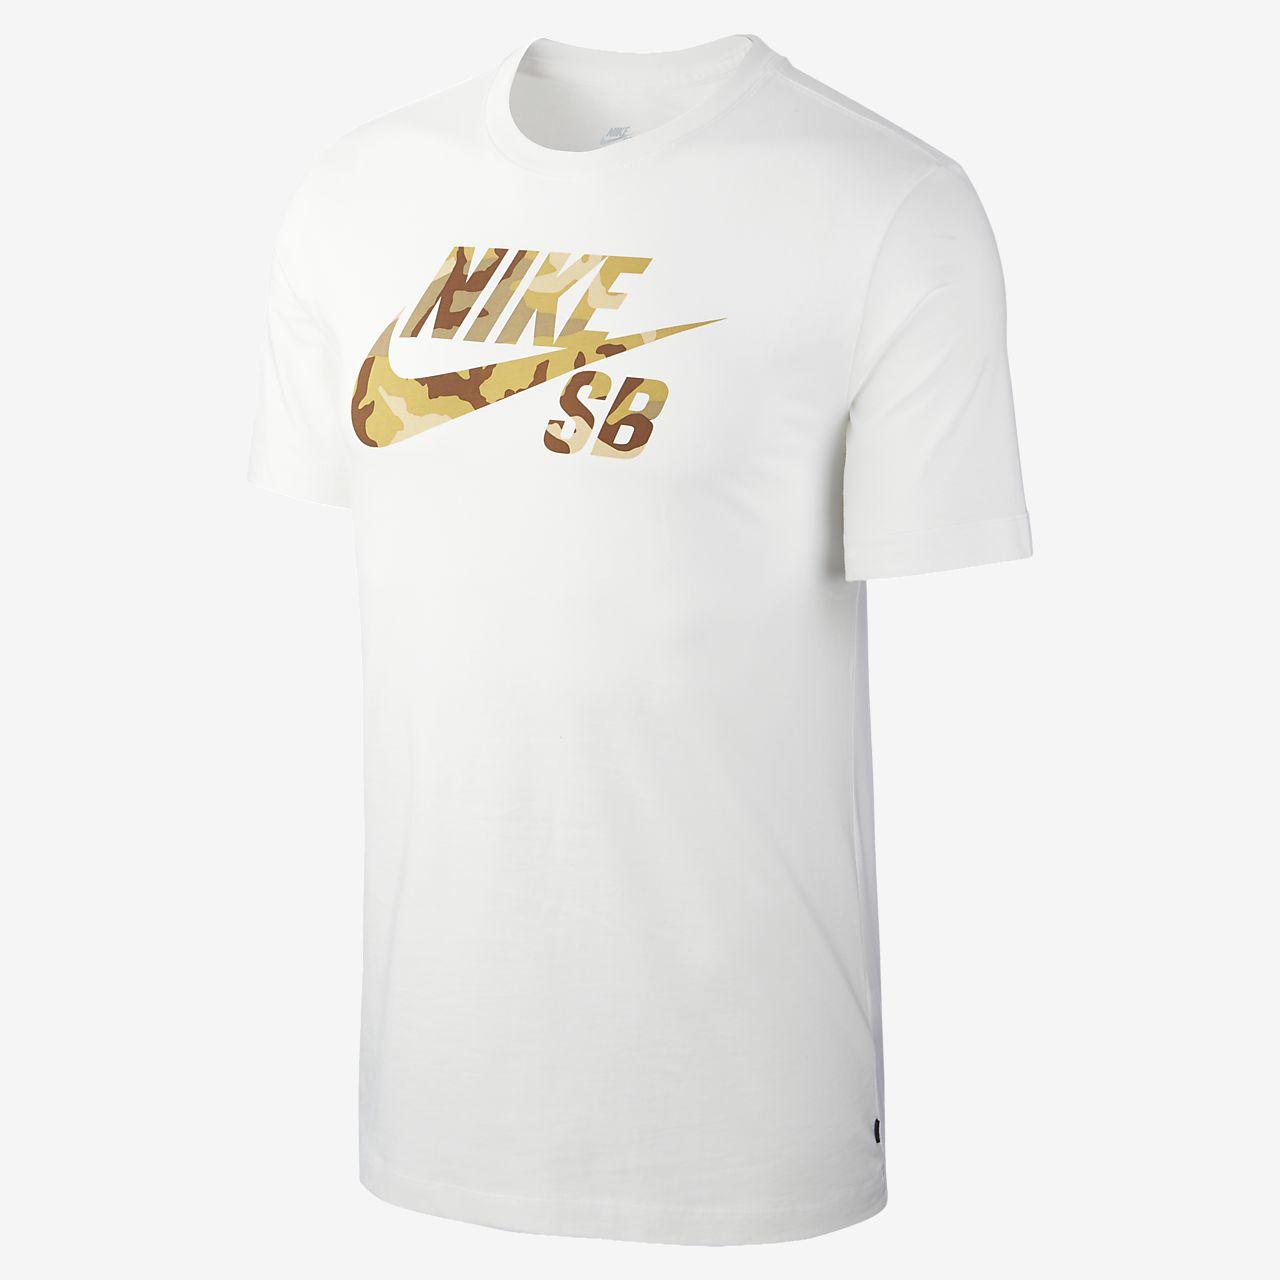 T-shirt de skateboard com logótipo Nike SB